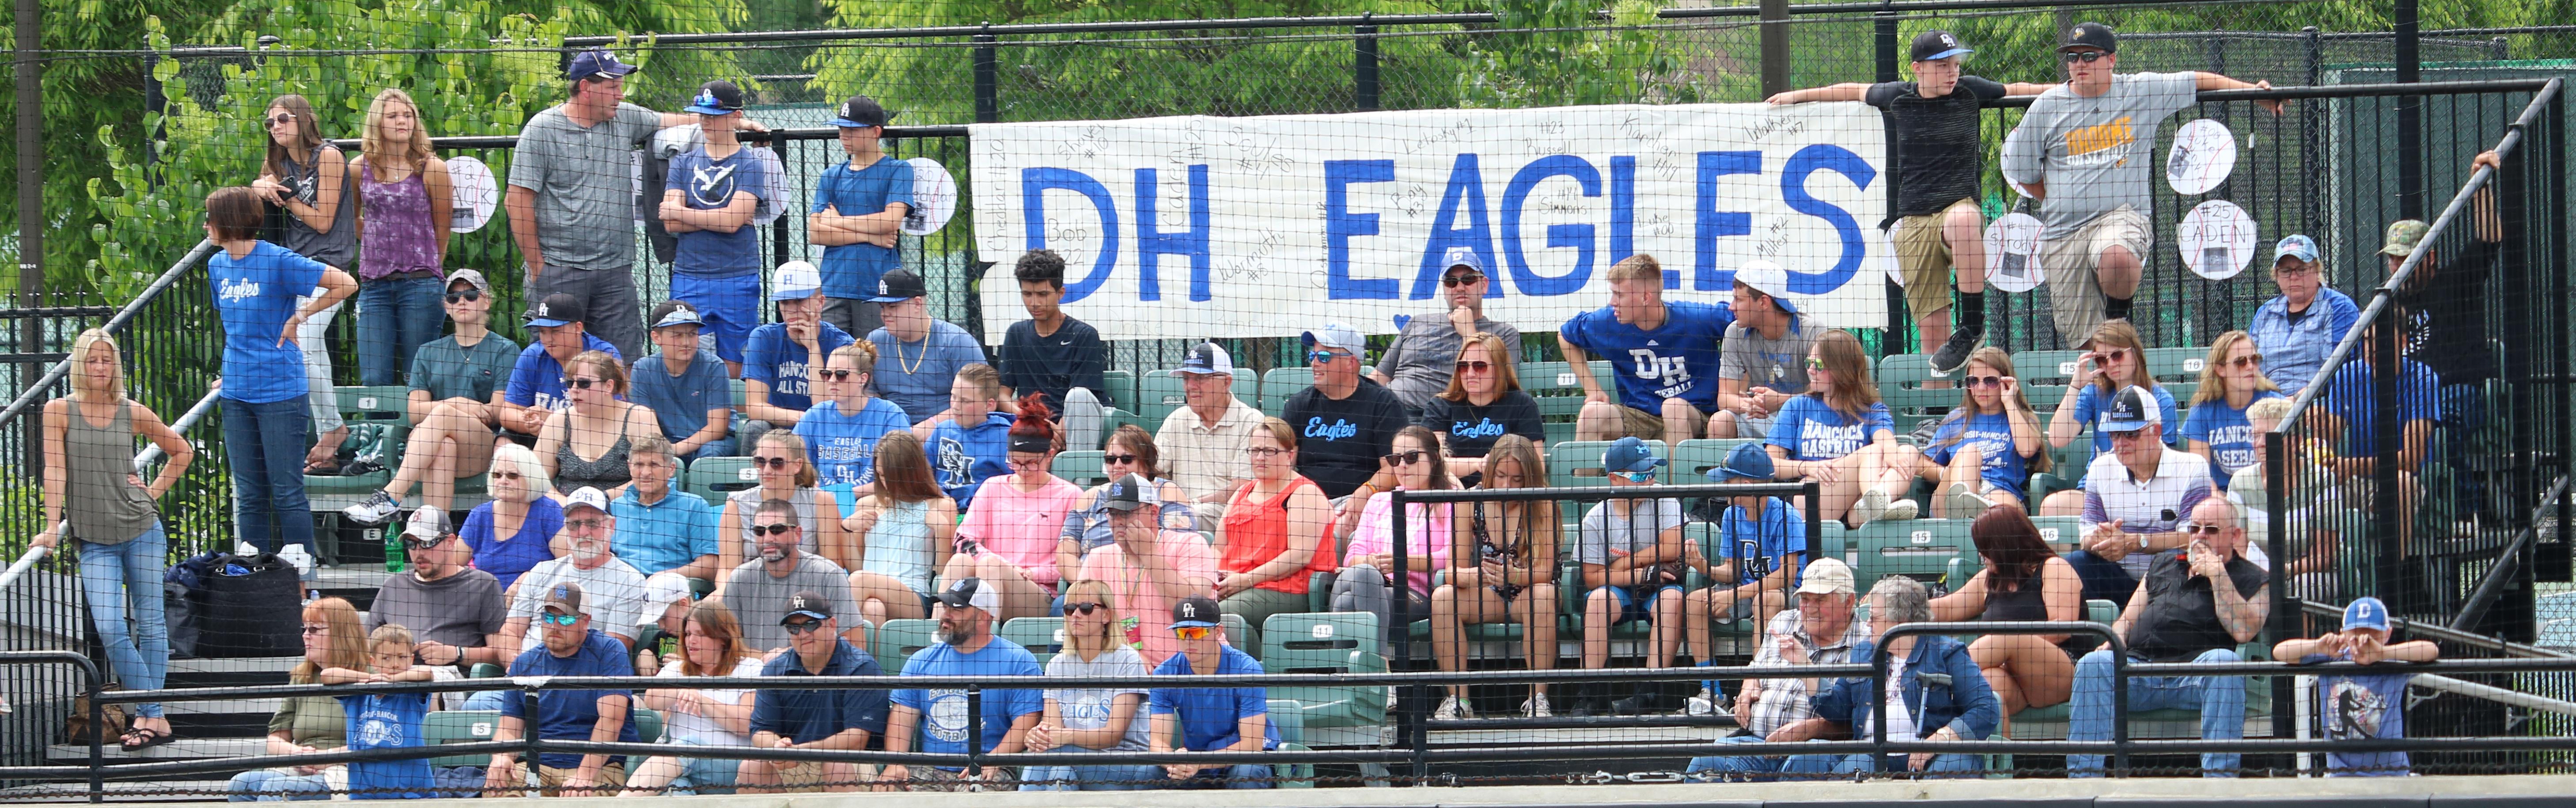 DH Eagles fans (group)